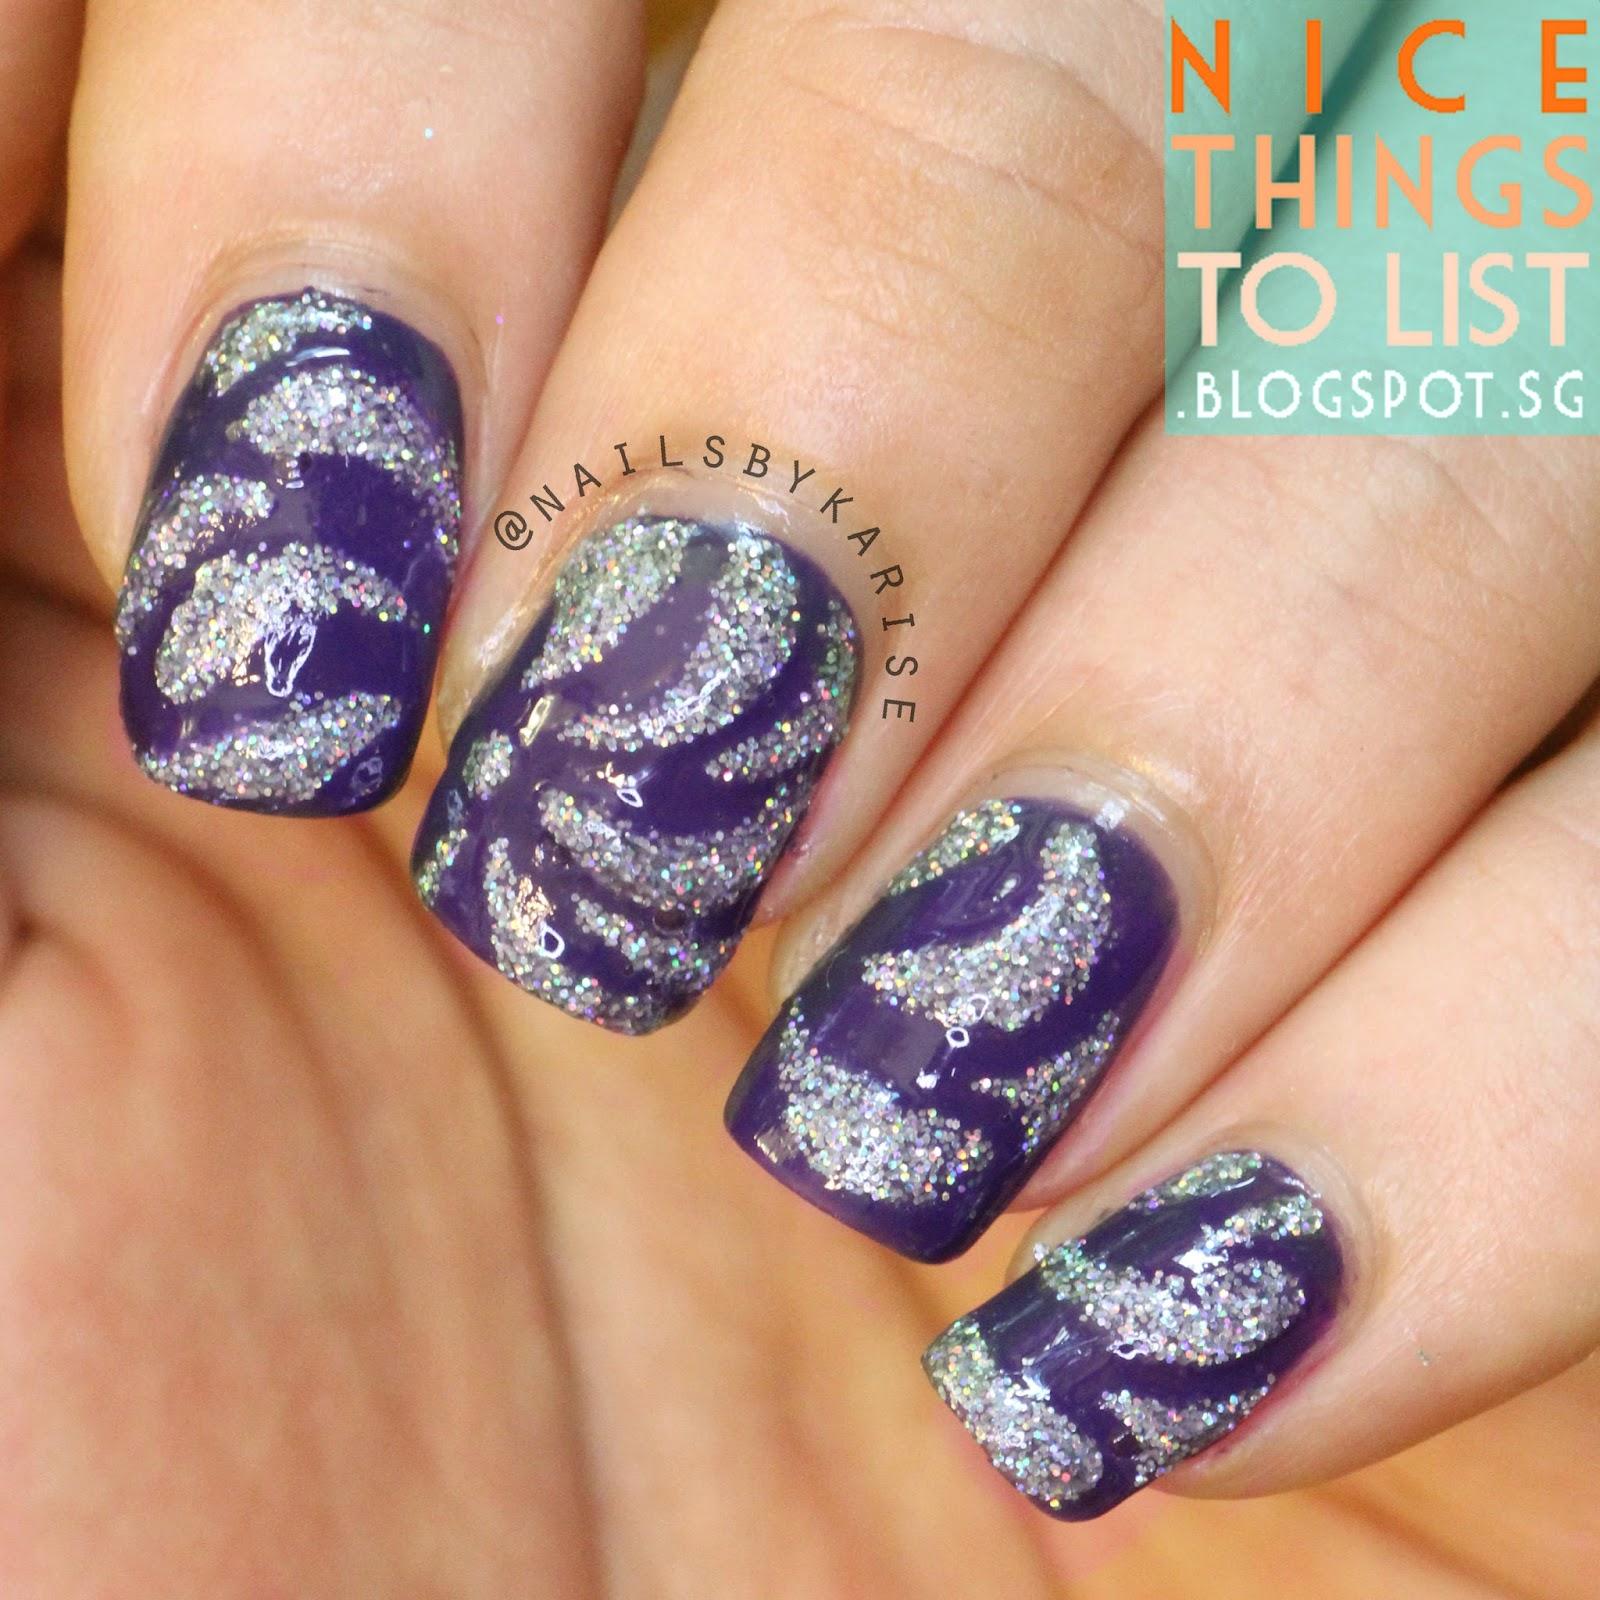 Spiral Nail art using Nail Vinyls from BornPrettyStore - Nice Things ...